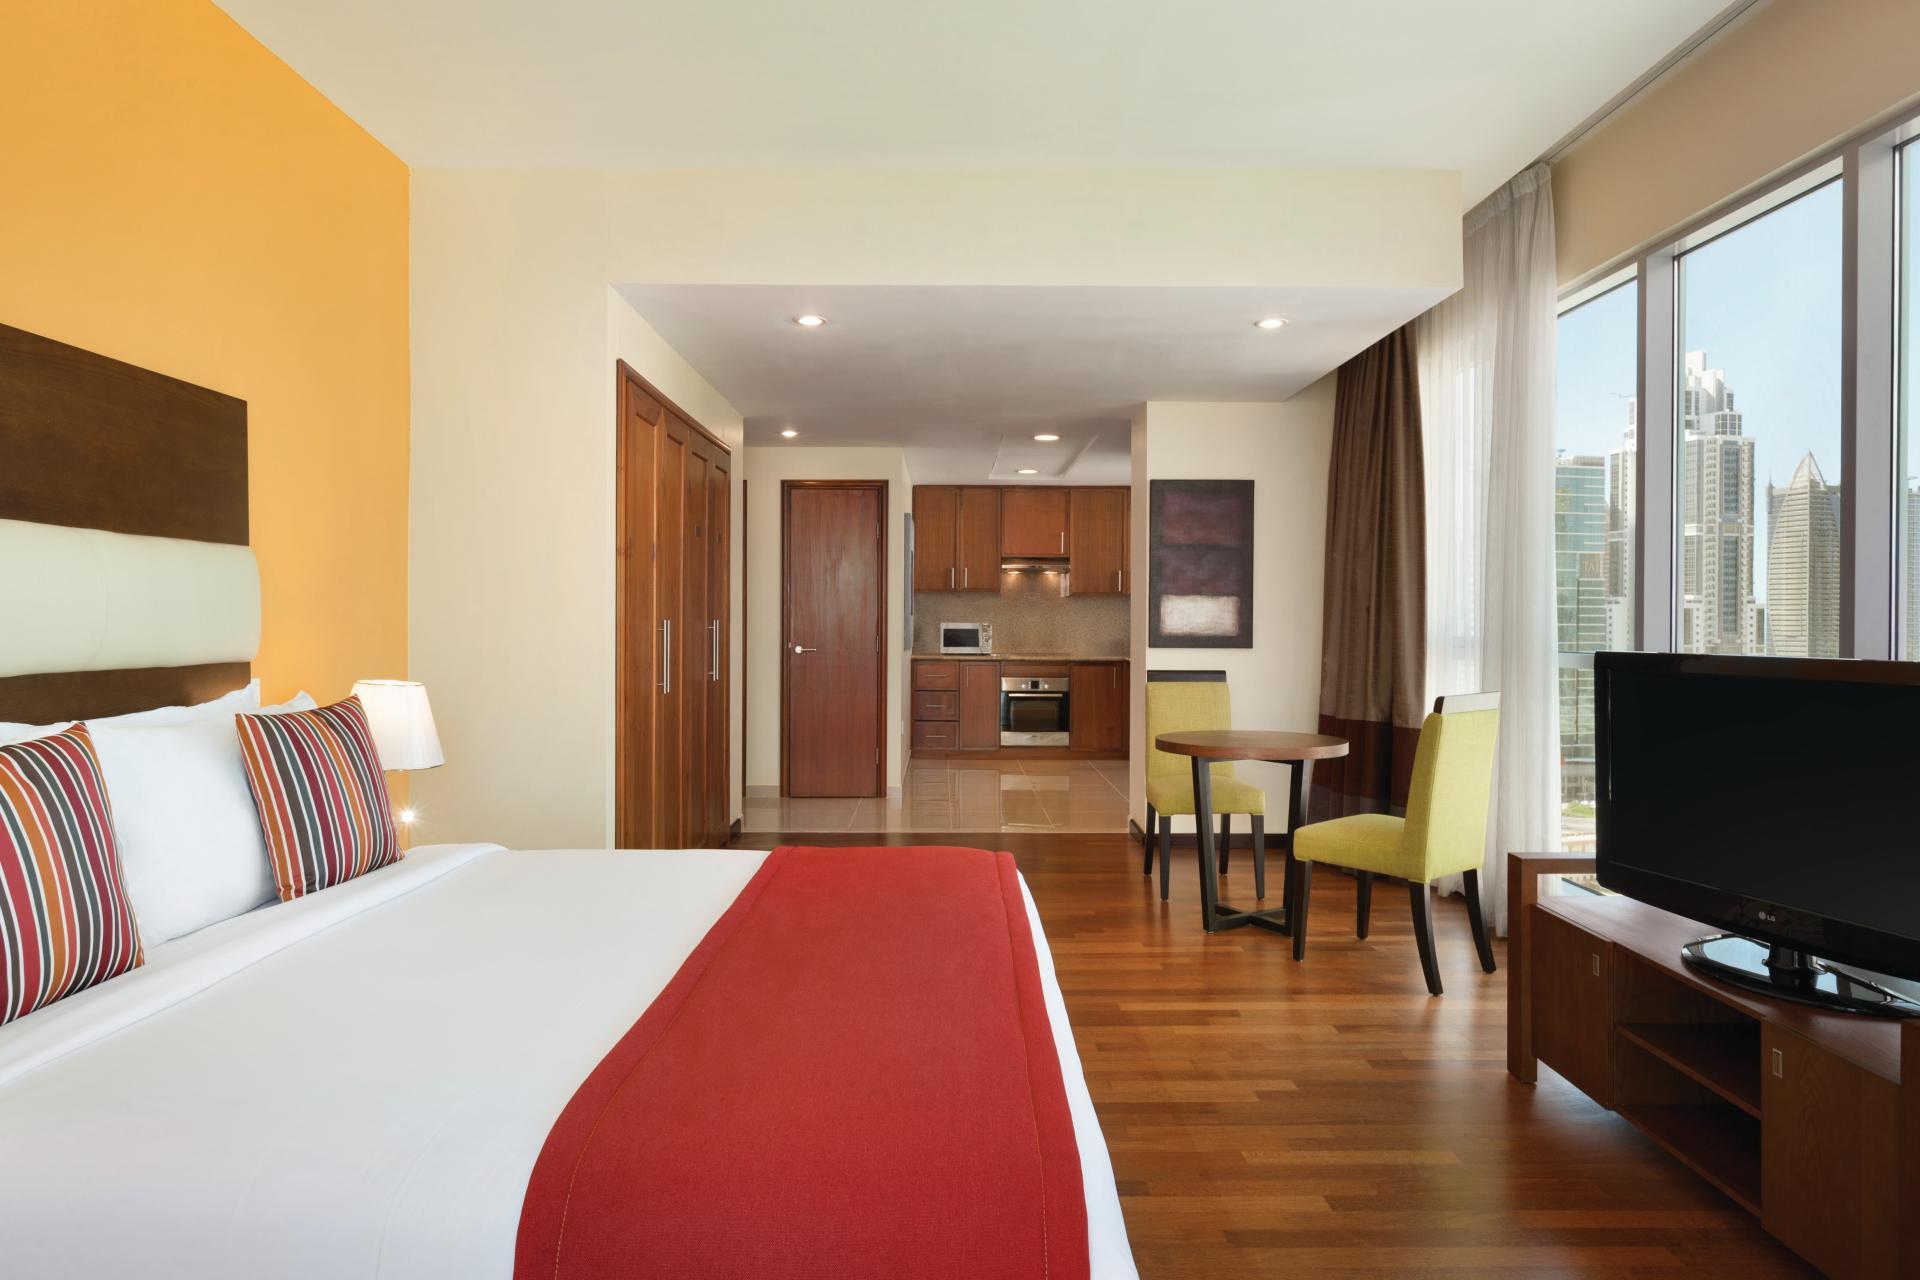 Bed Ramada at Downtown Dubai Apartments - Citybase Apartments